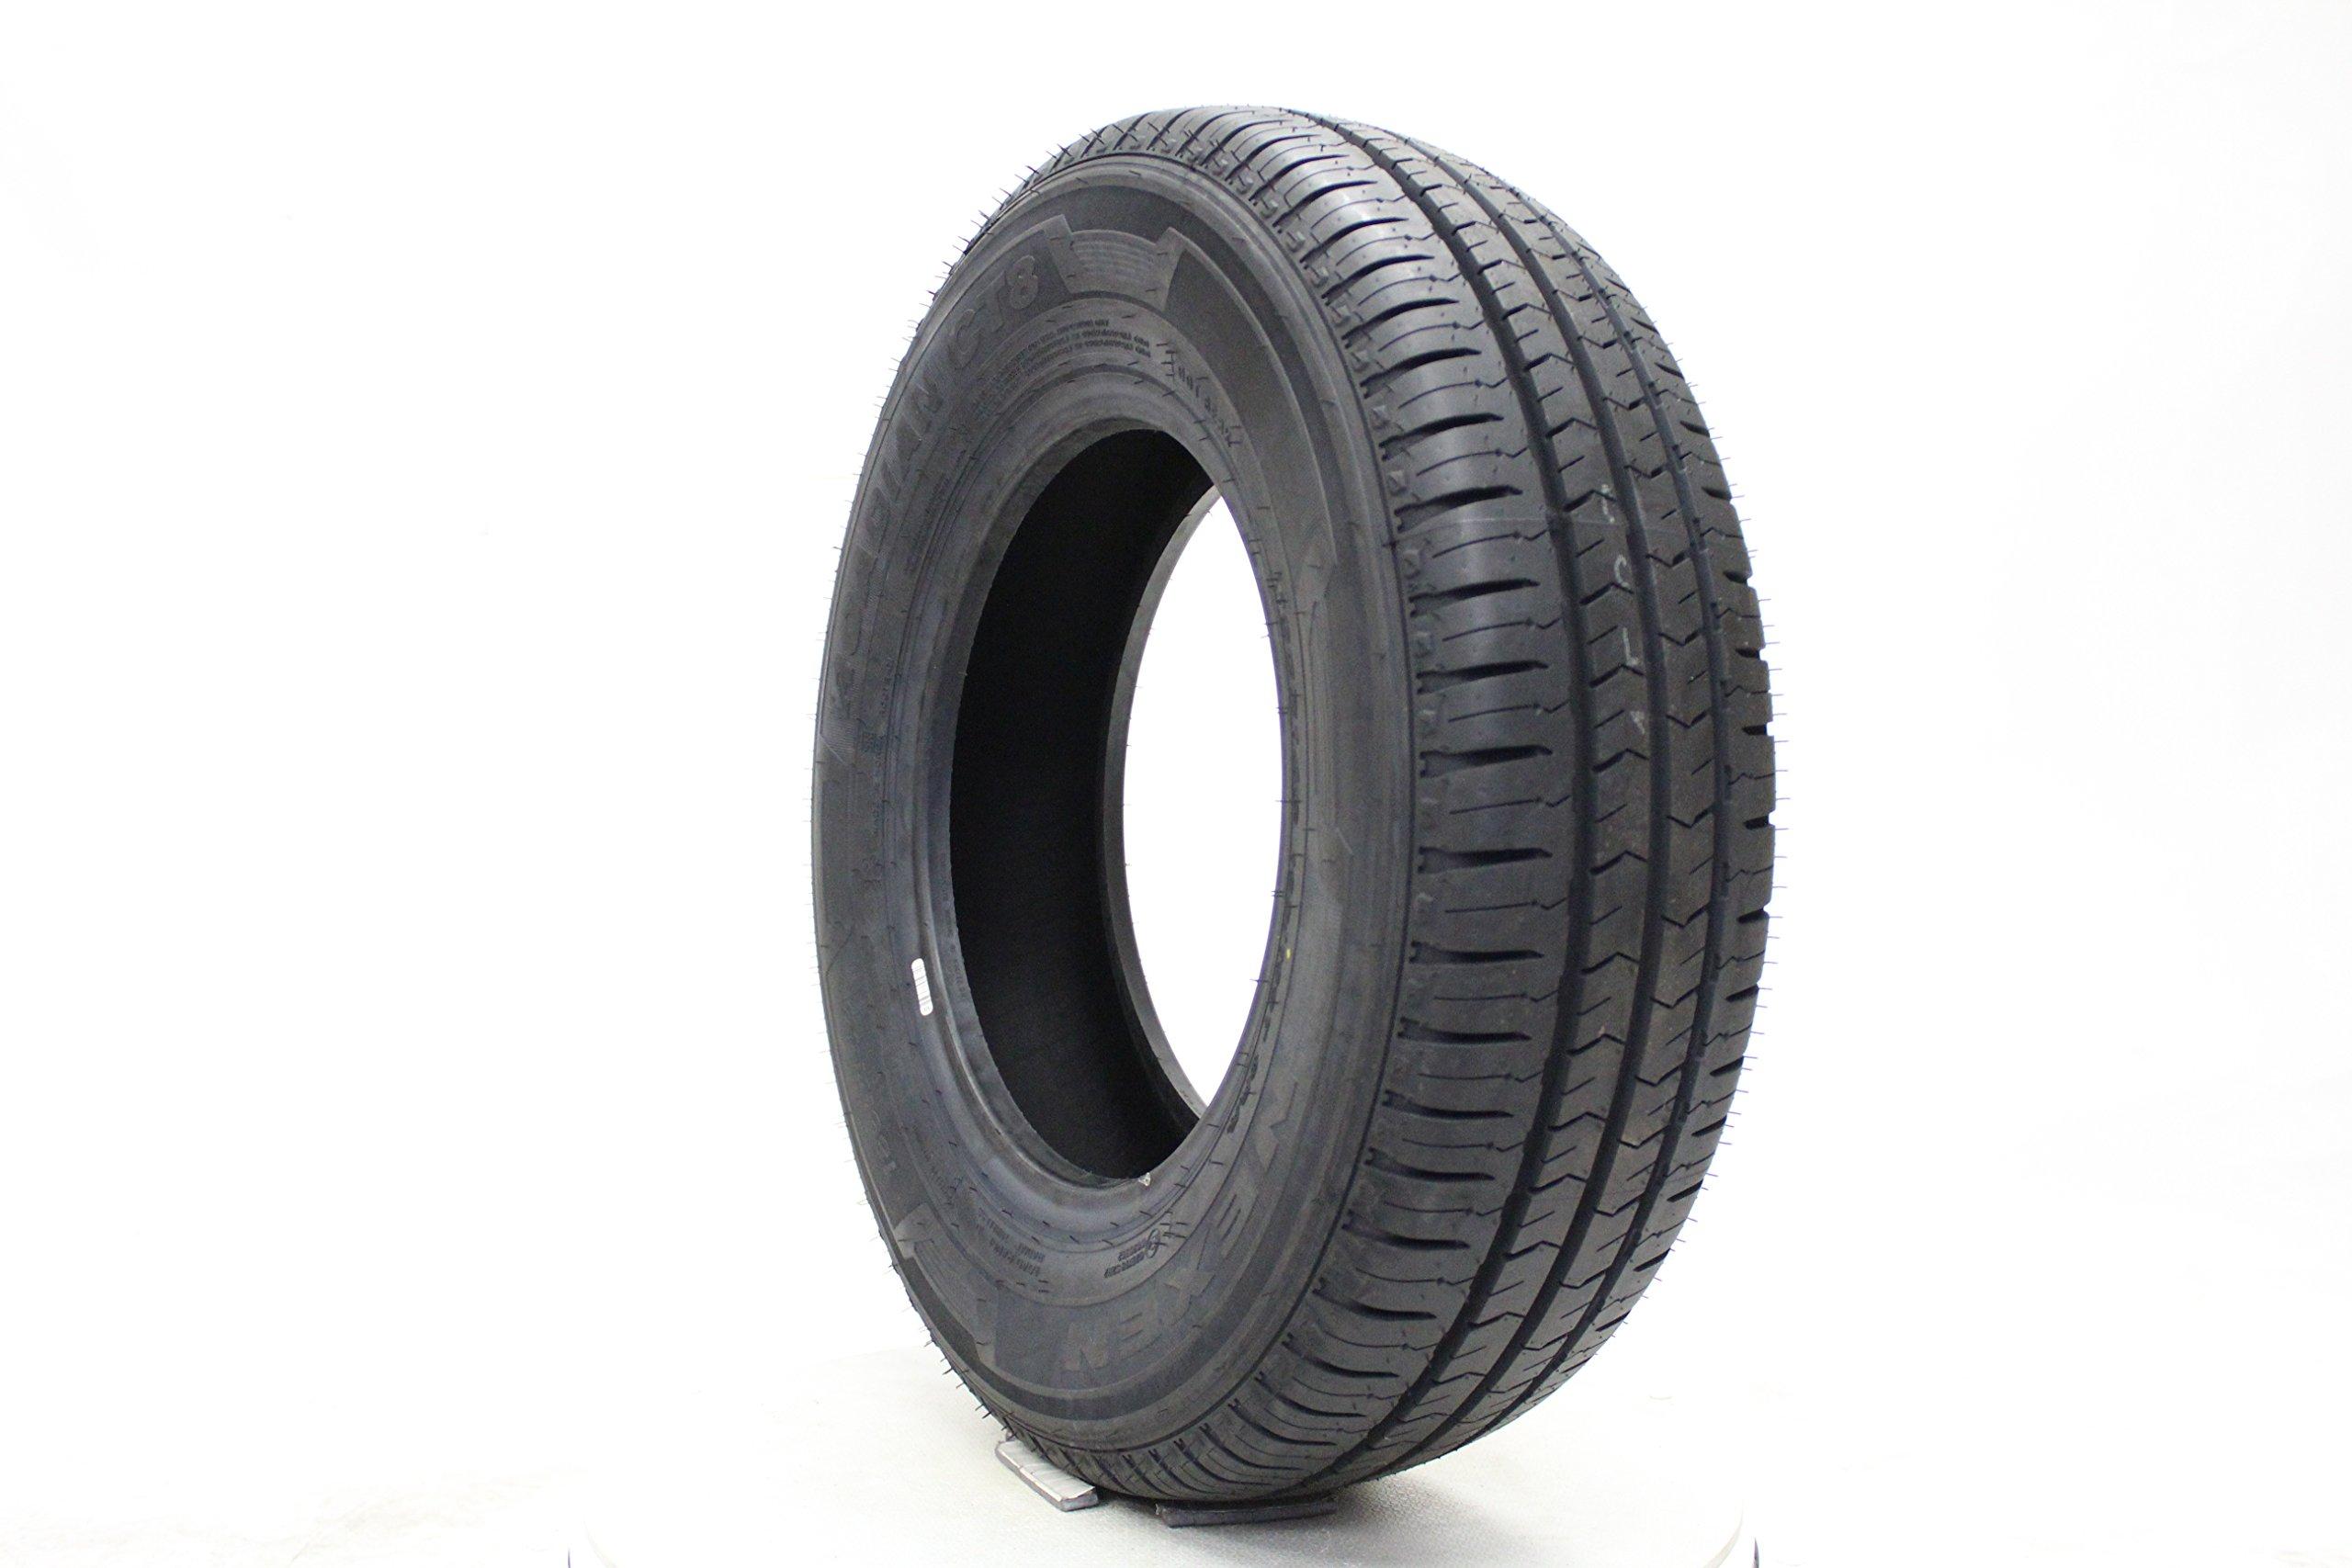 Nexen ROADIAN CT8 All- Season Radial Tire-235/80R17 120R 10-ply